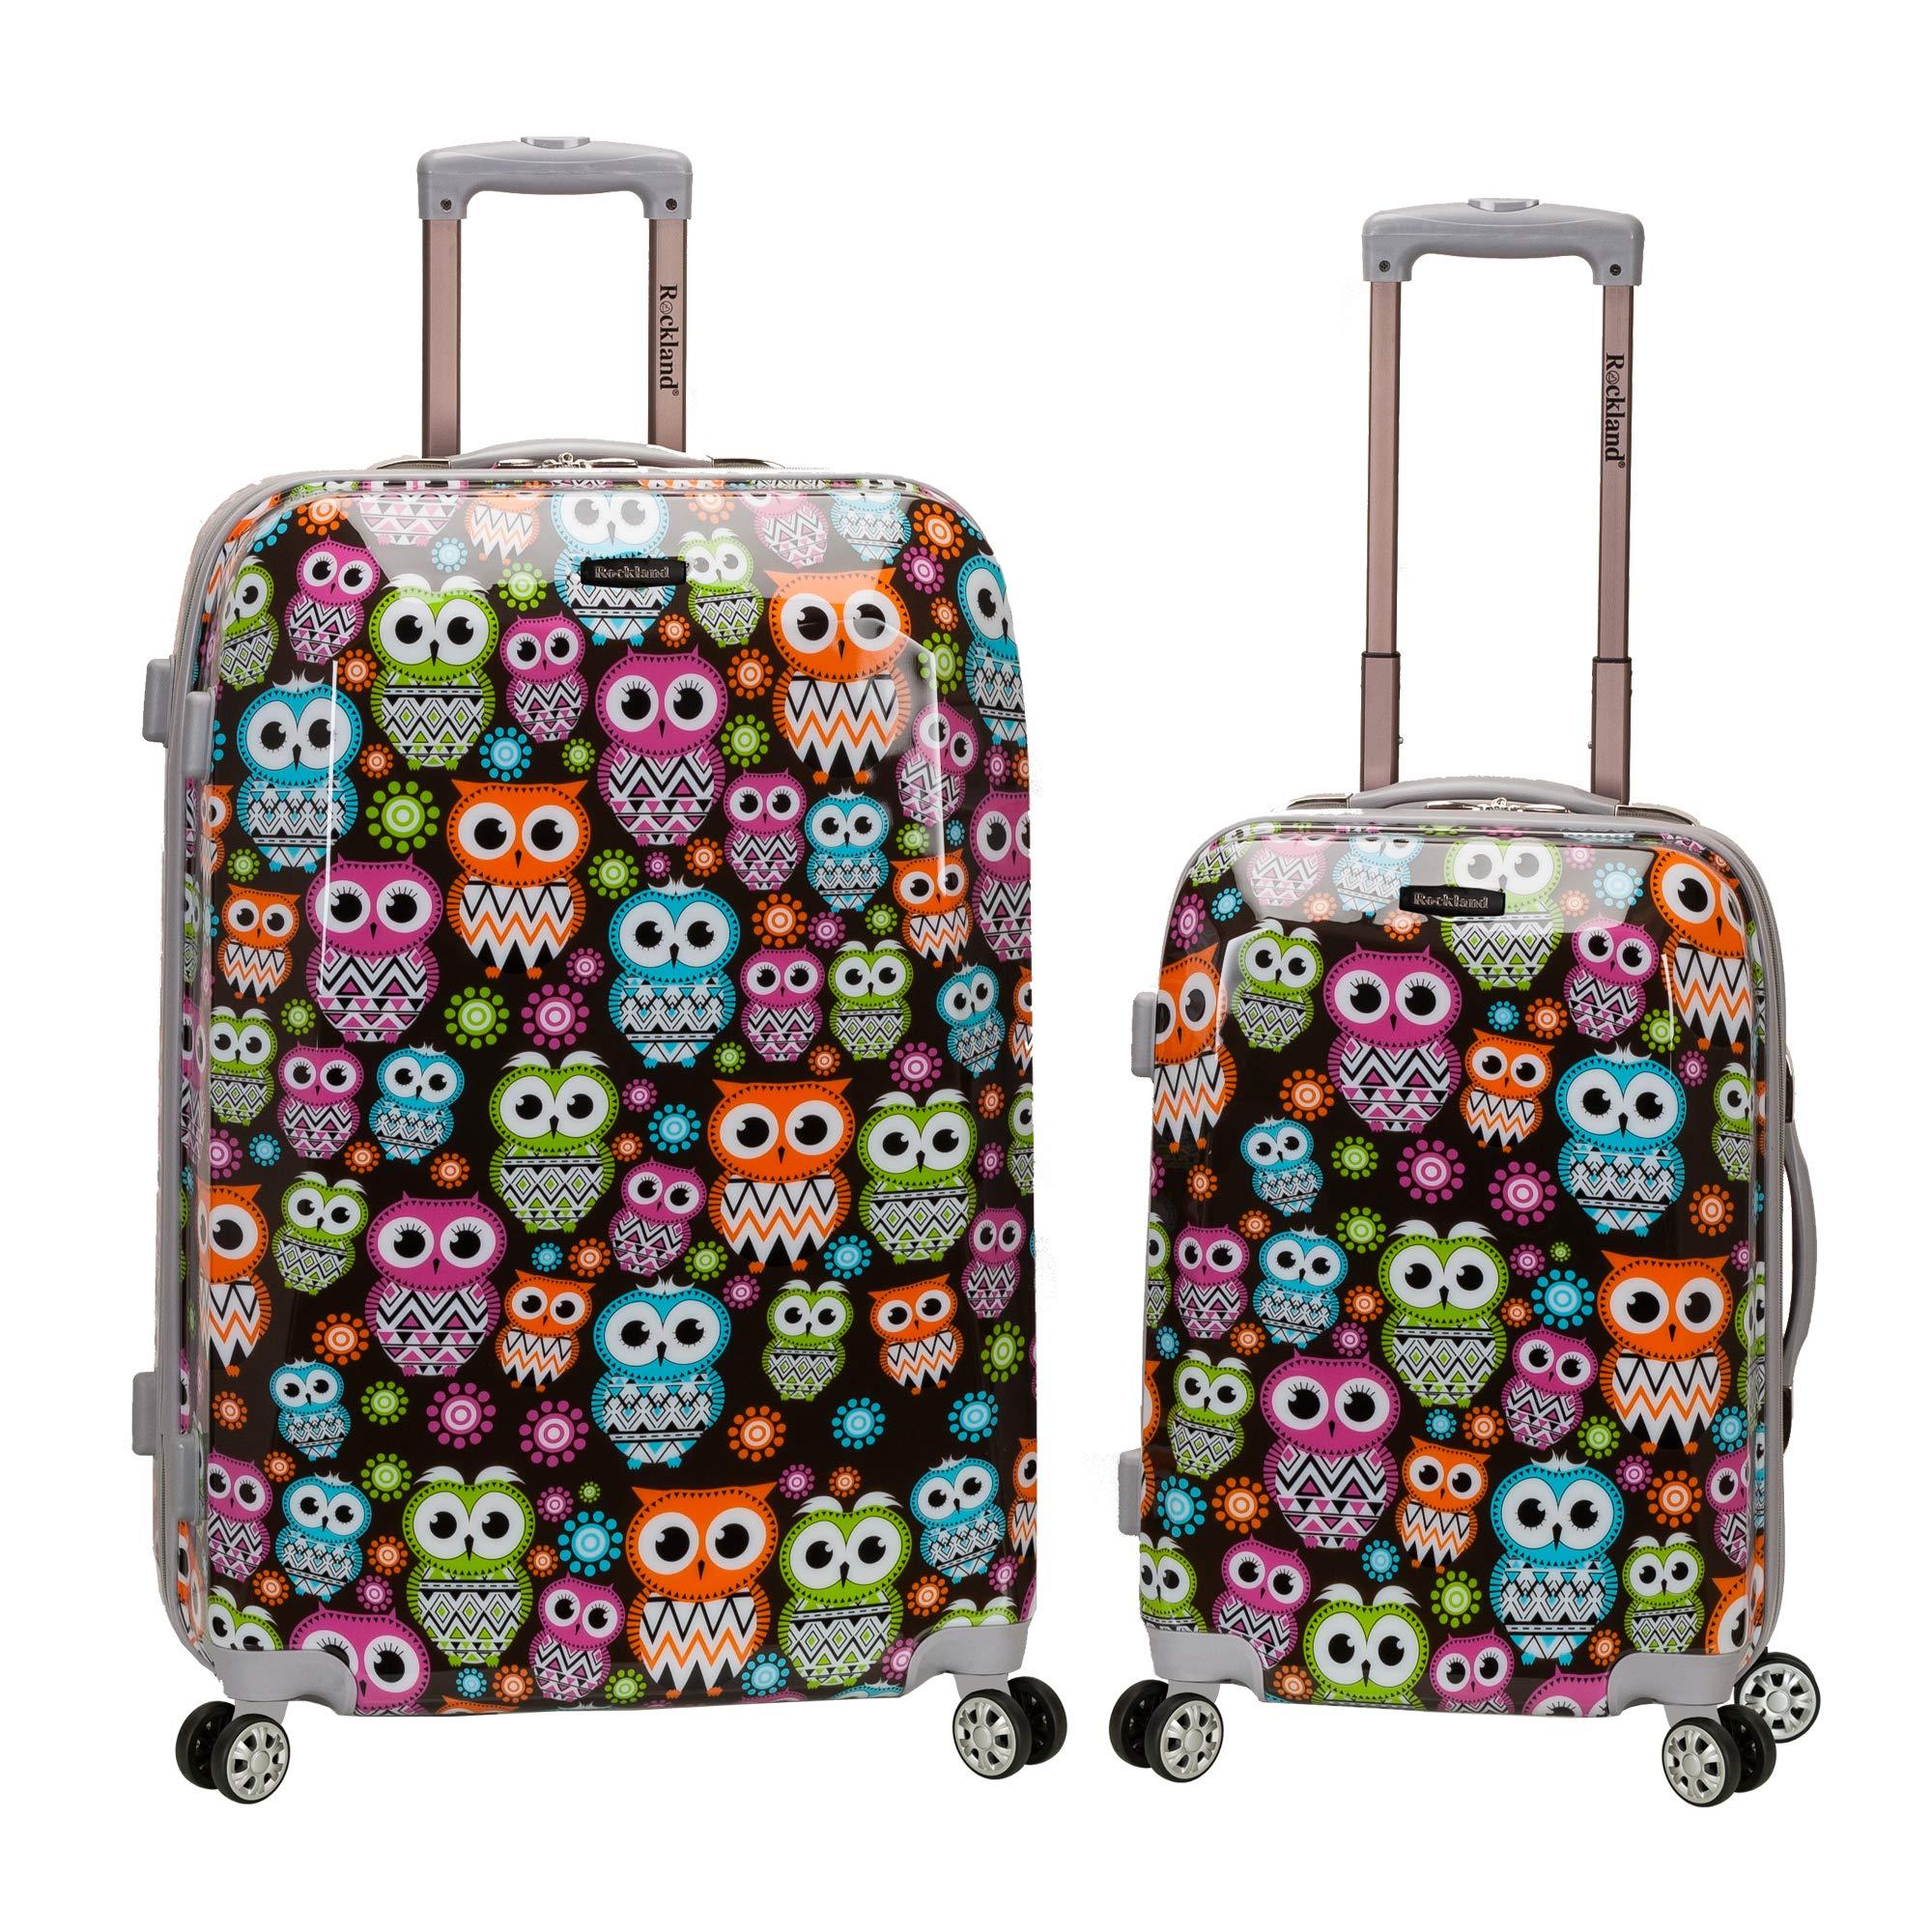 Rockland 2 Piece Upright Luggage Set, Owl, One Size